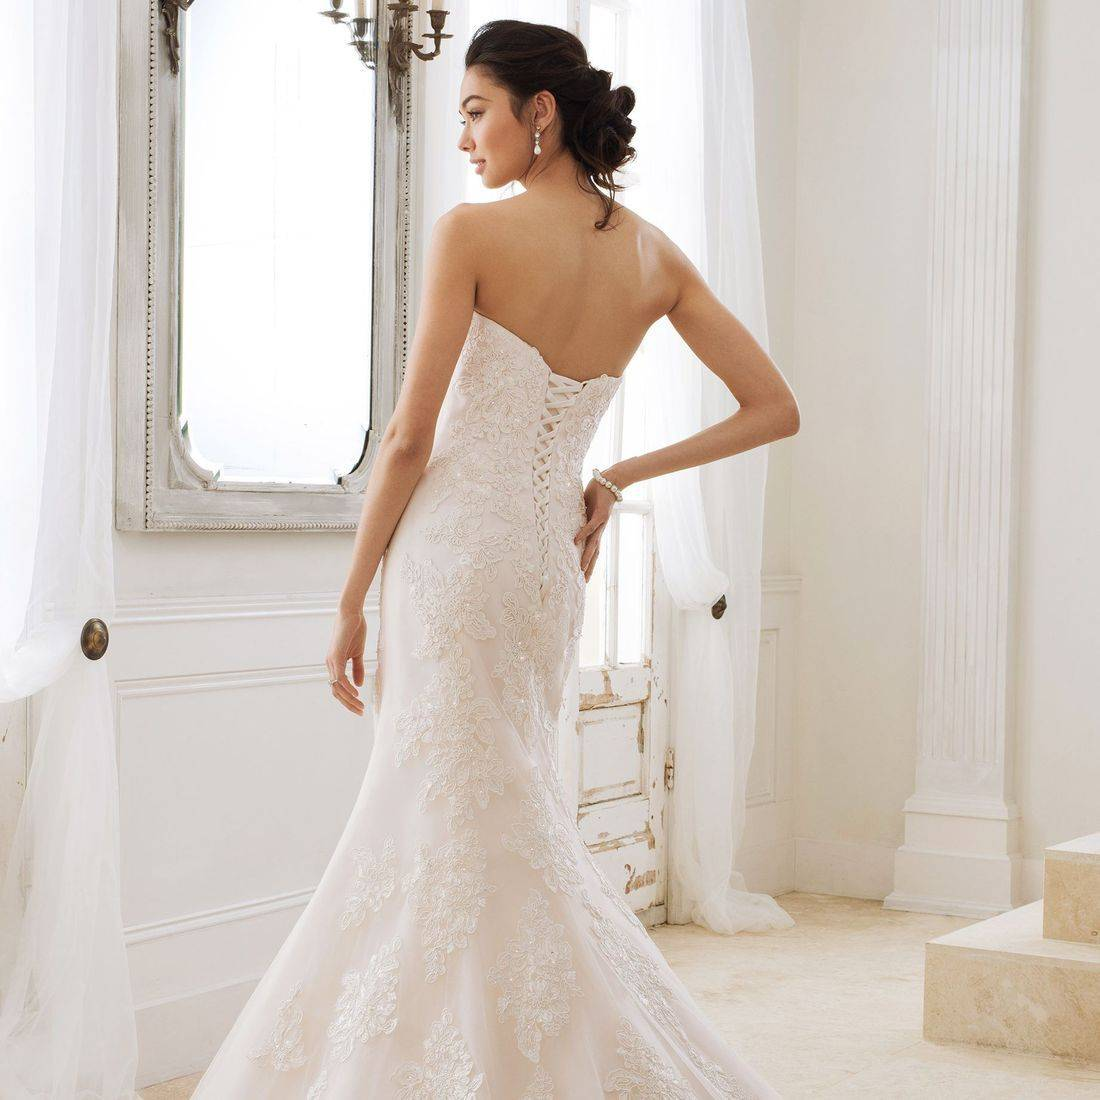 Sophia Tolli, Sophia Tolli wedding dress, fit and flare wedding dress, lace wedding dress, corset back wedding dress